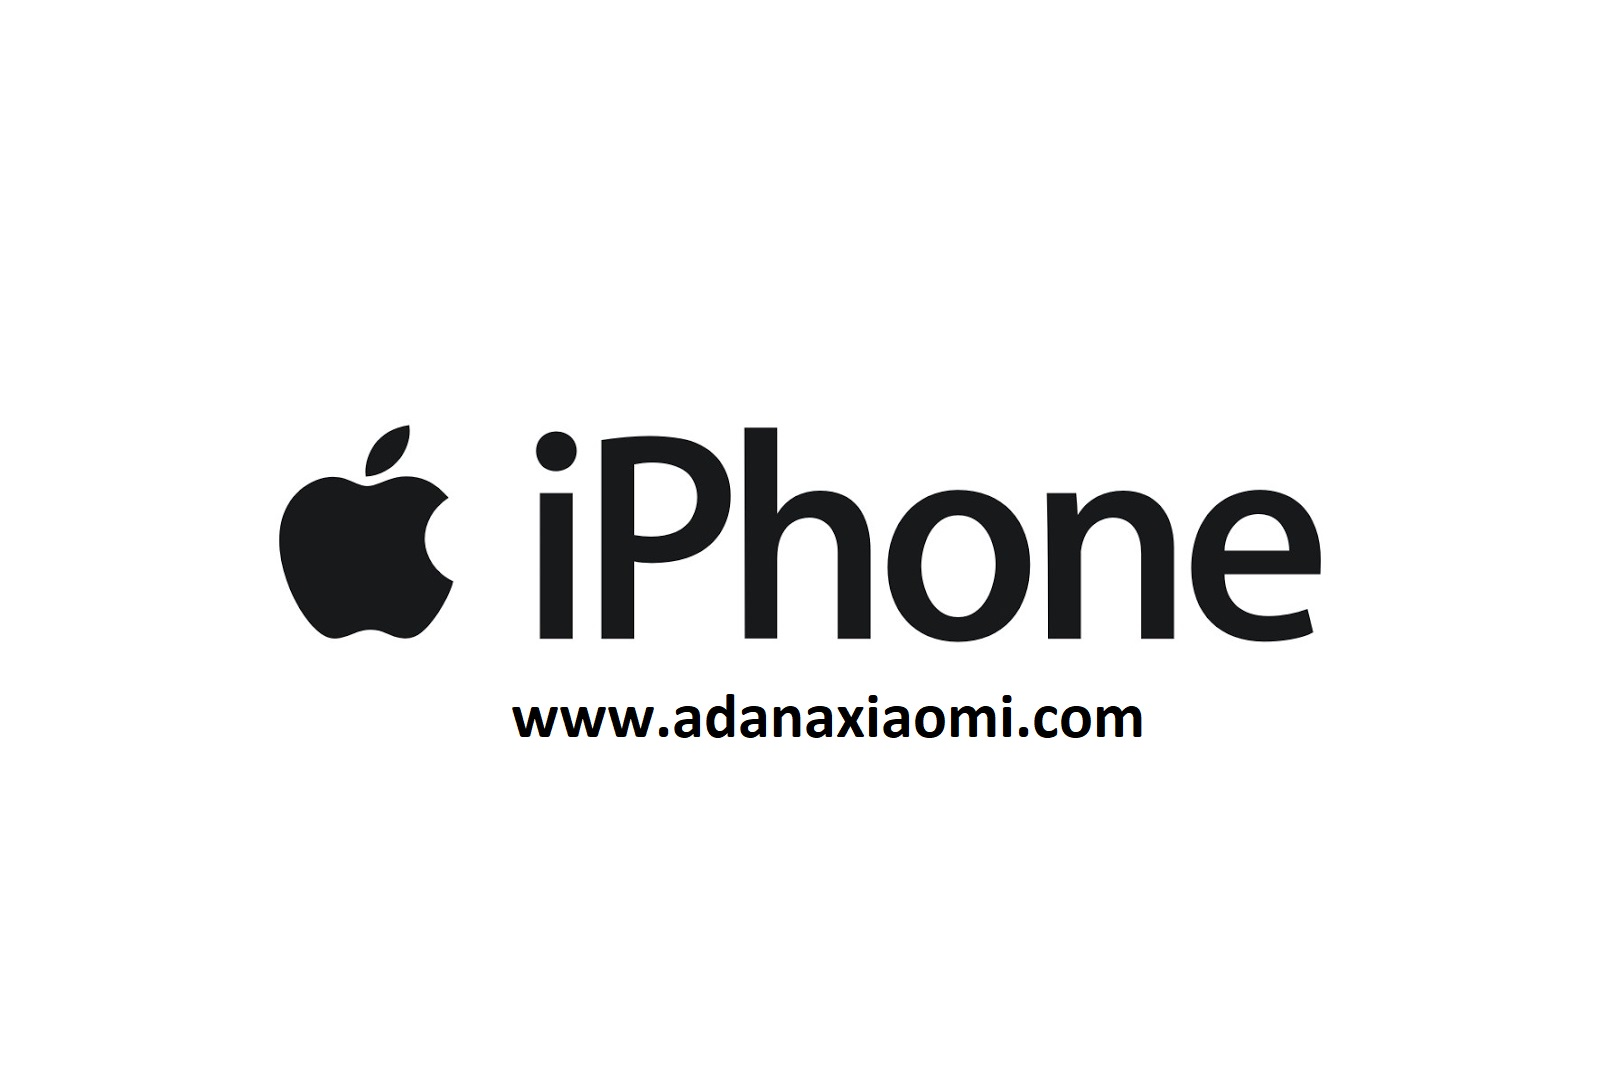 Adana iPhone Teknik Servis 0 322 422 56 76